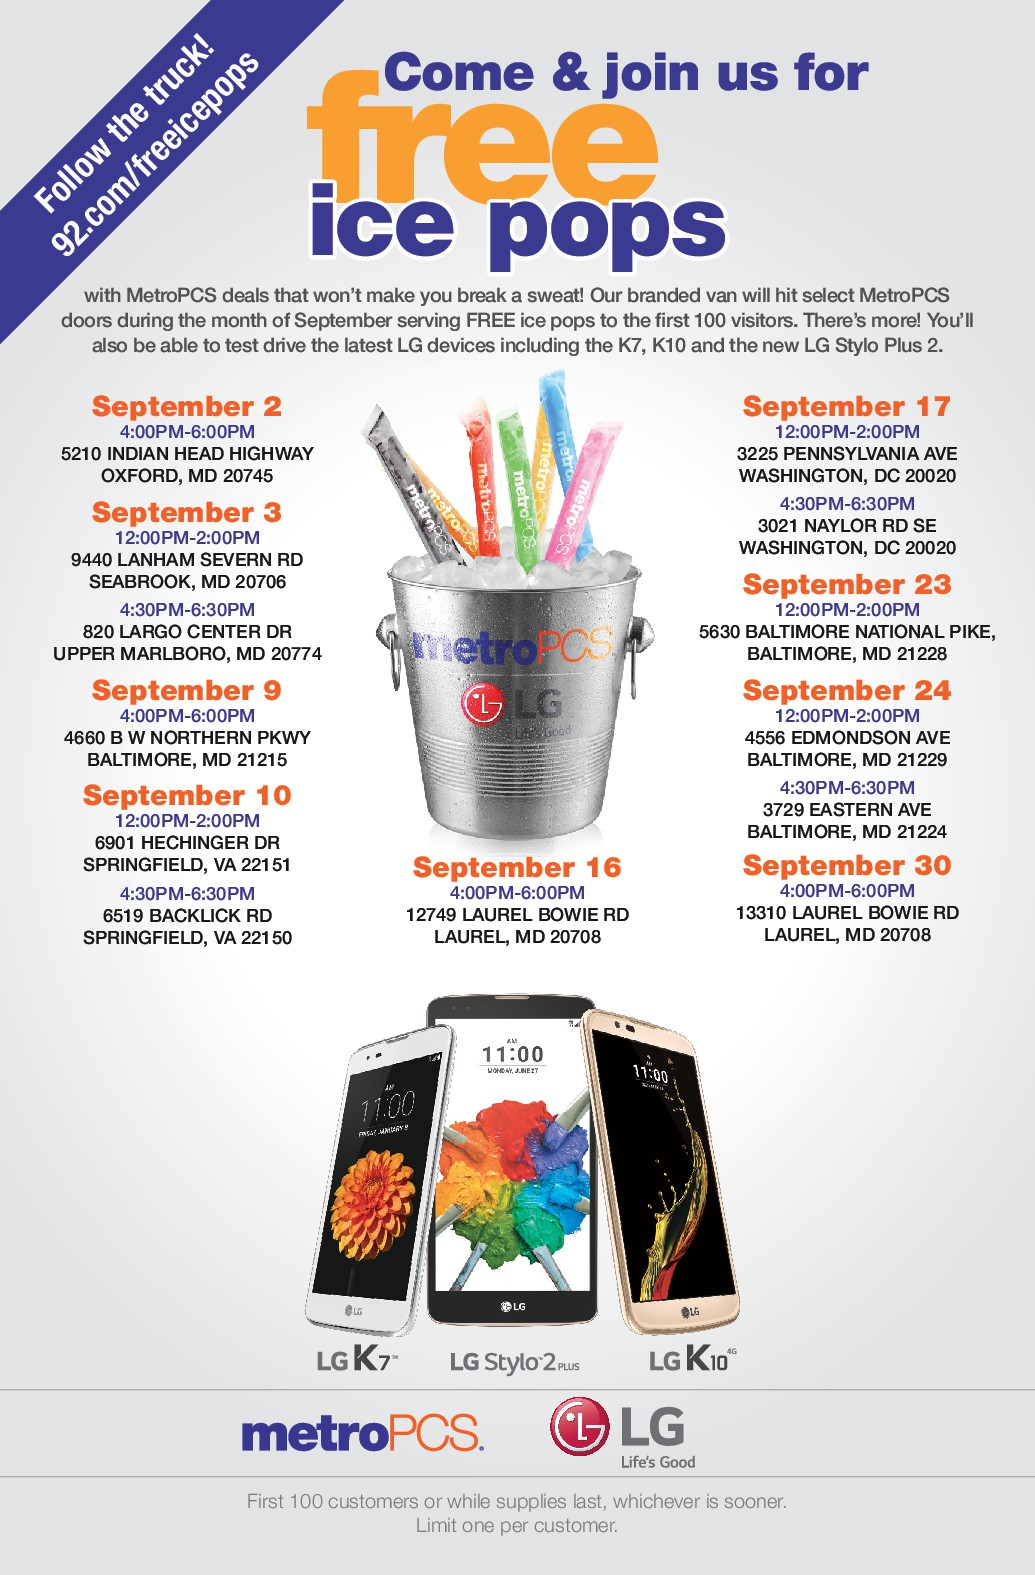 MetroPCS Free Ice Pops Sept 2016